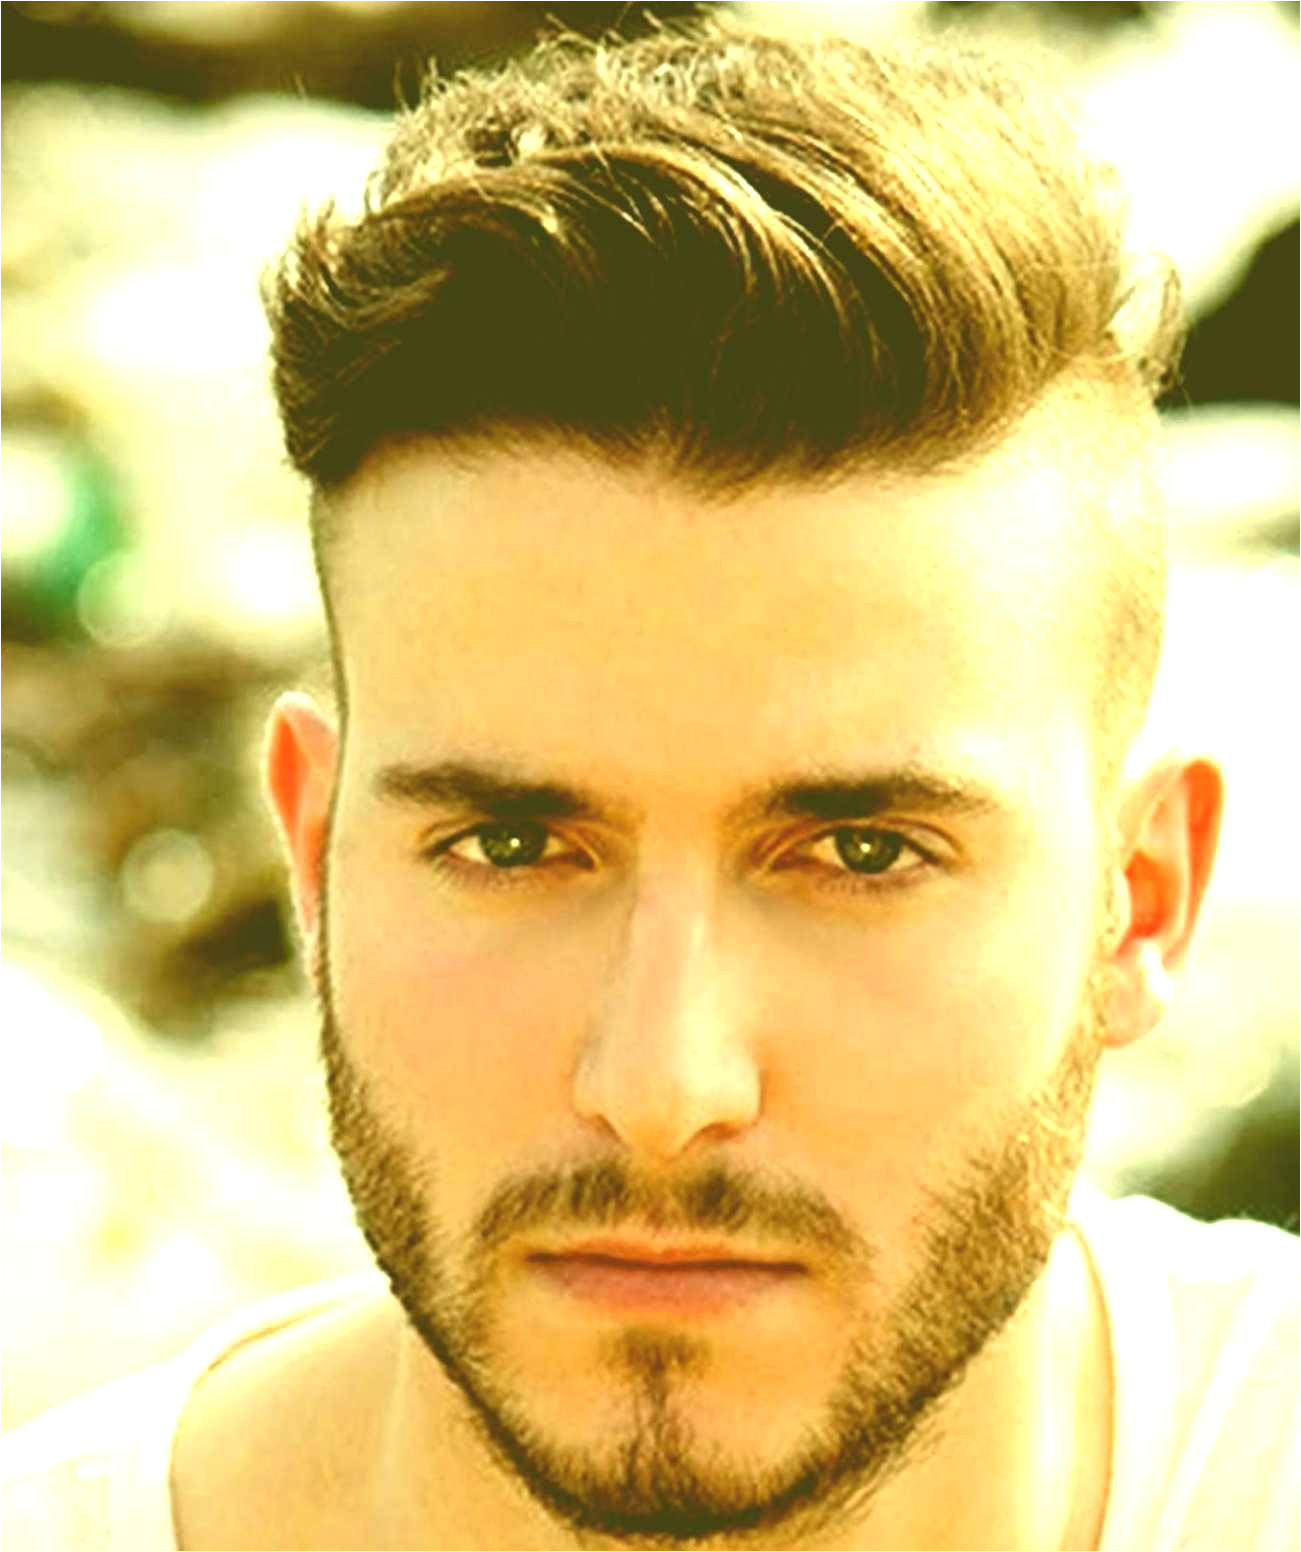 Mens Hairstyles Medium Thick Beautiful top Haircuts for Men Short Hairstyles for Men New Hairstyles Men